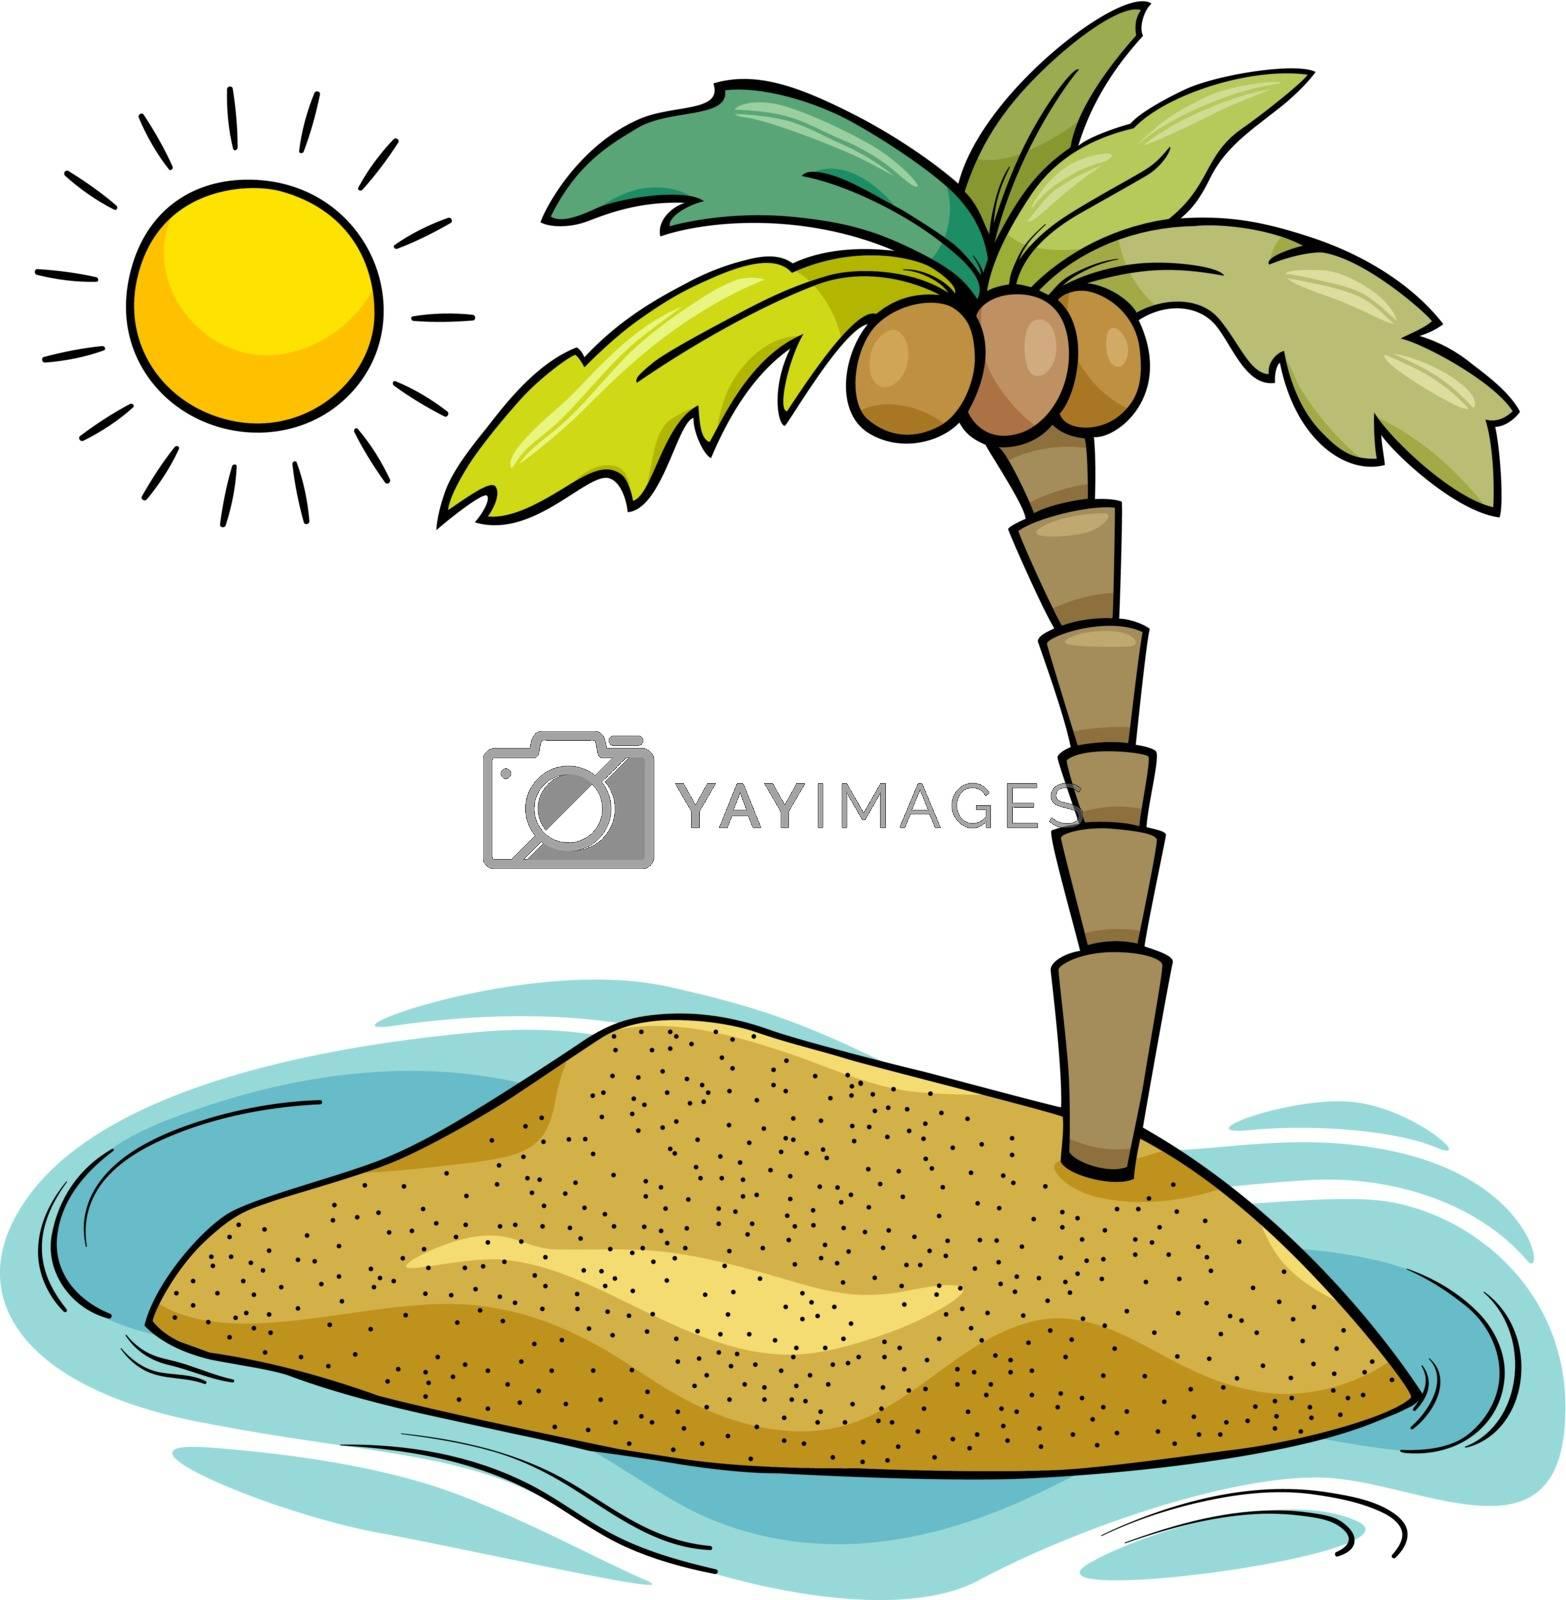 Royalty free image of desert island cartoon illustration by izakowski